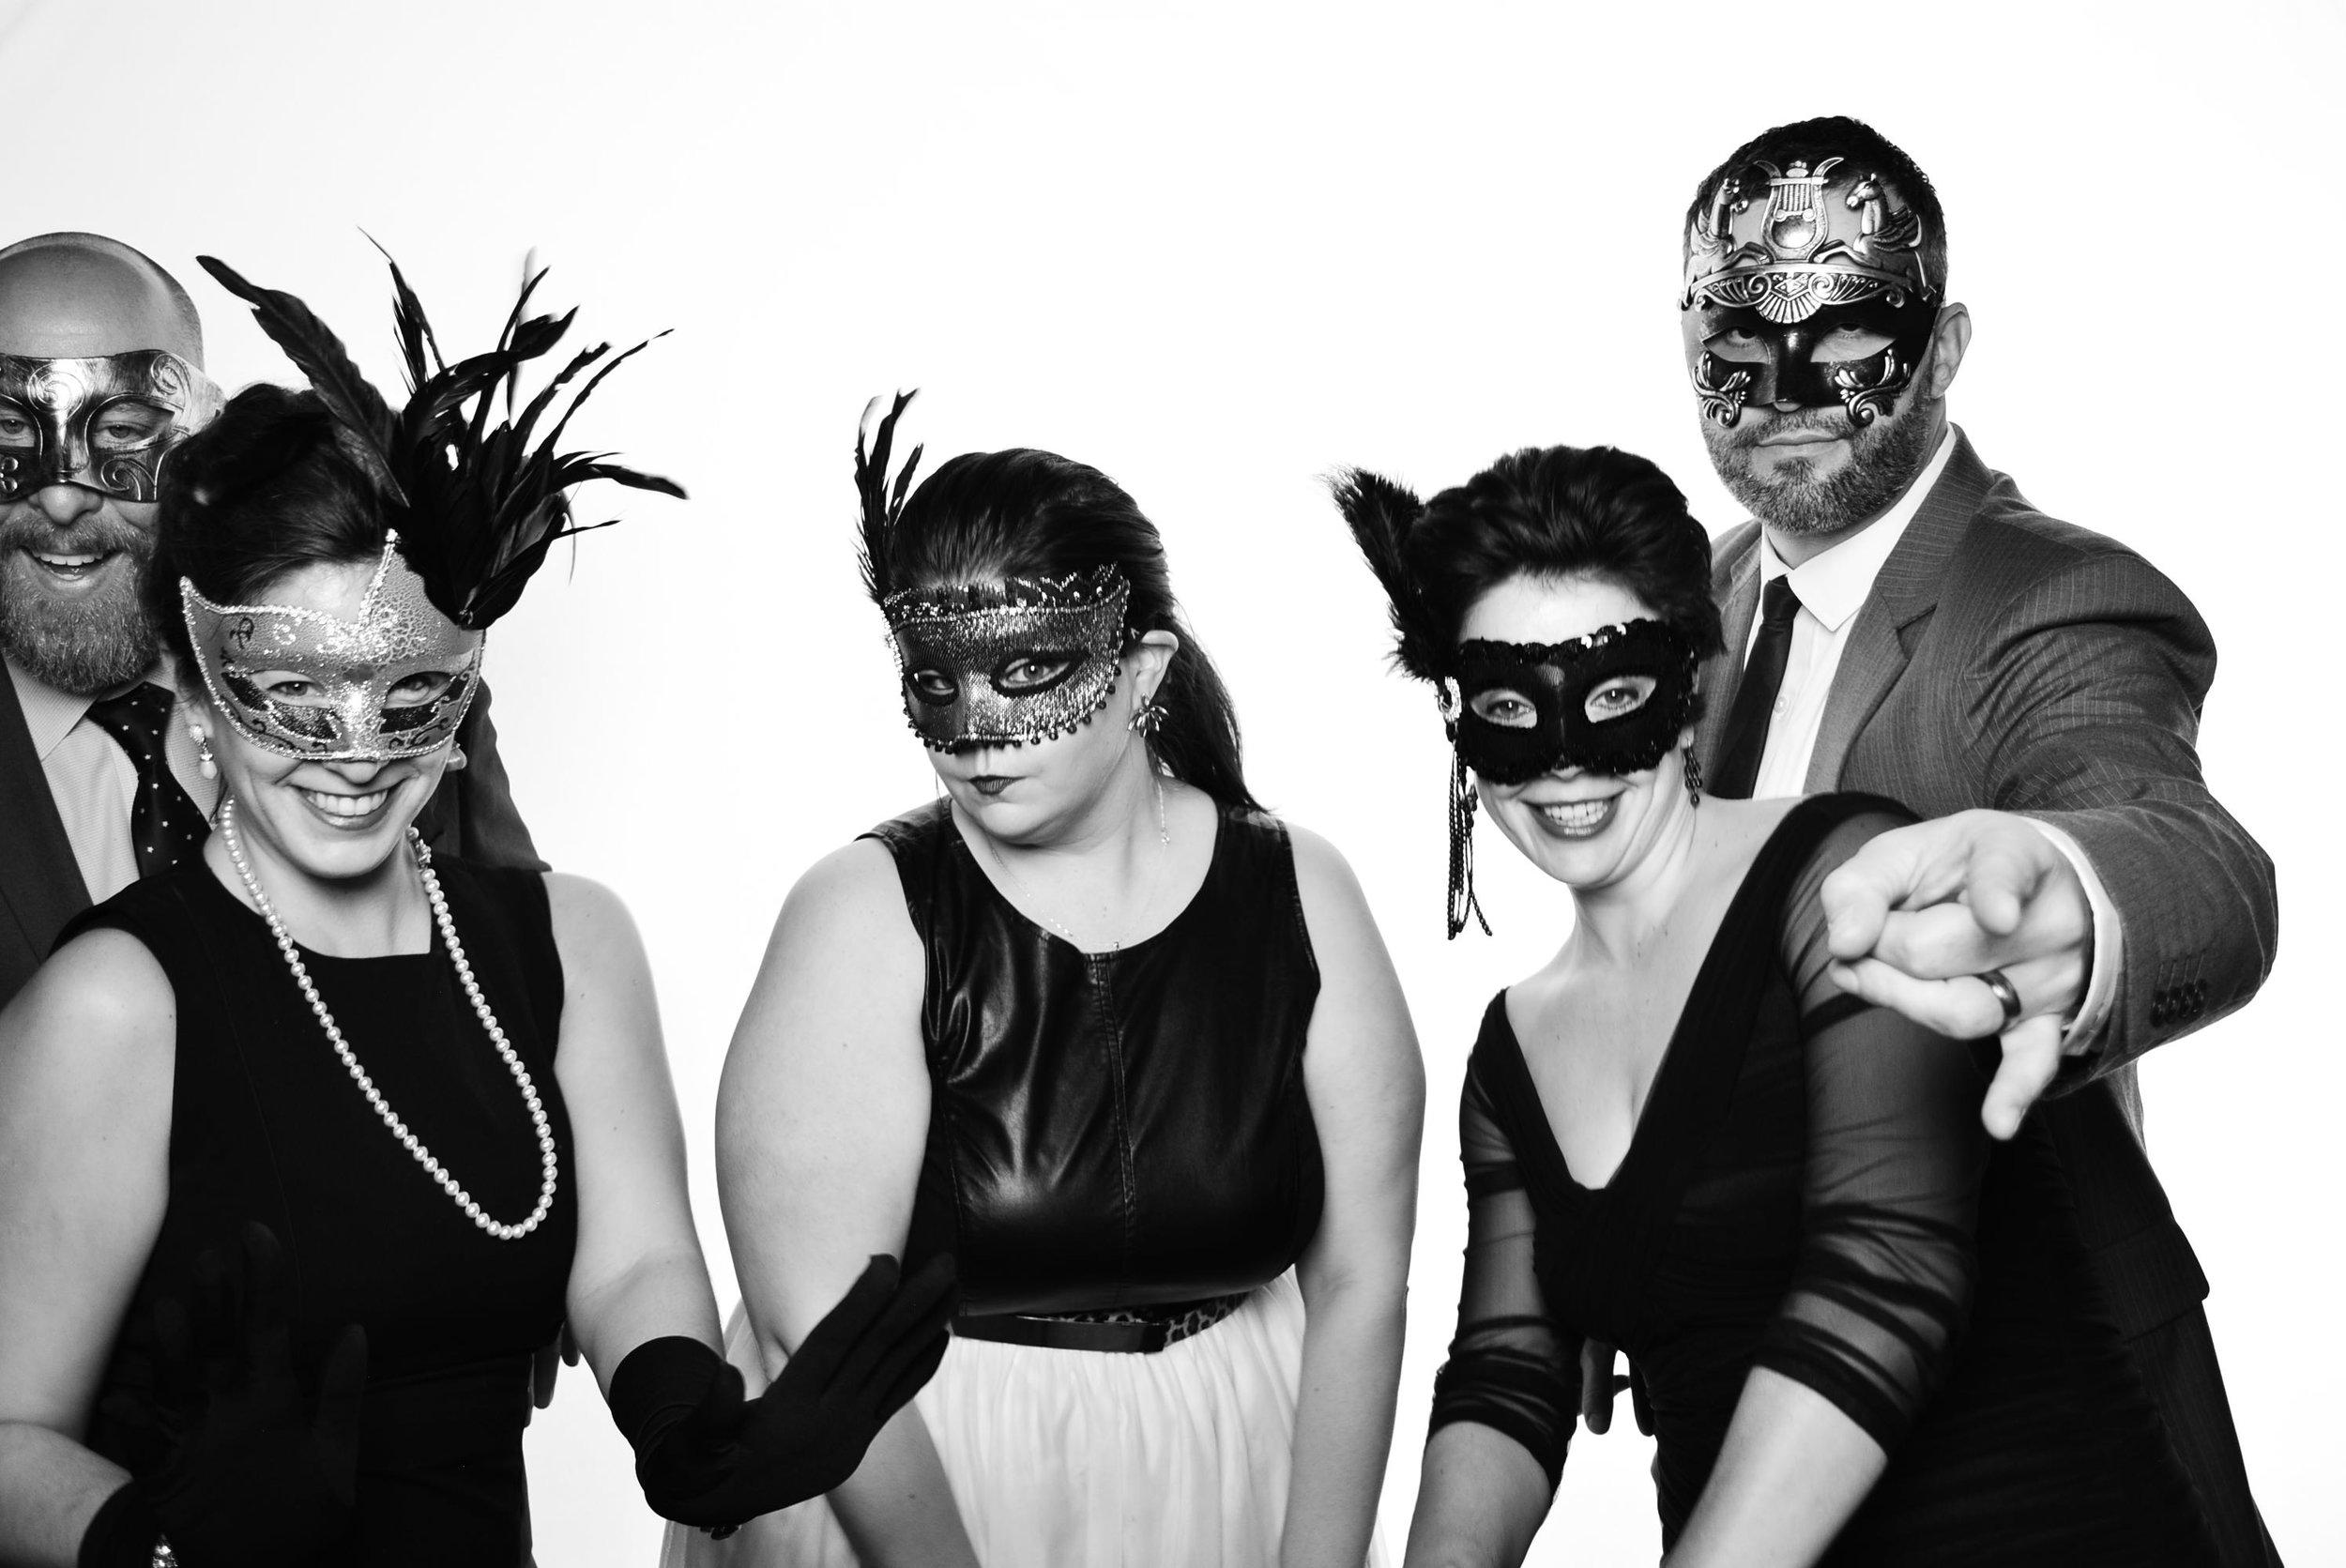 6th Annual Downtown Inc Masquerade Ball — Downtown Inc